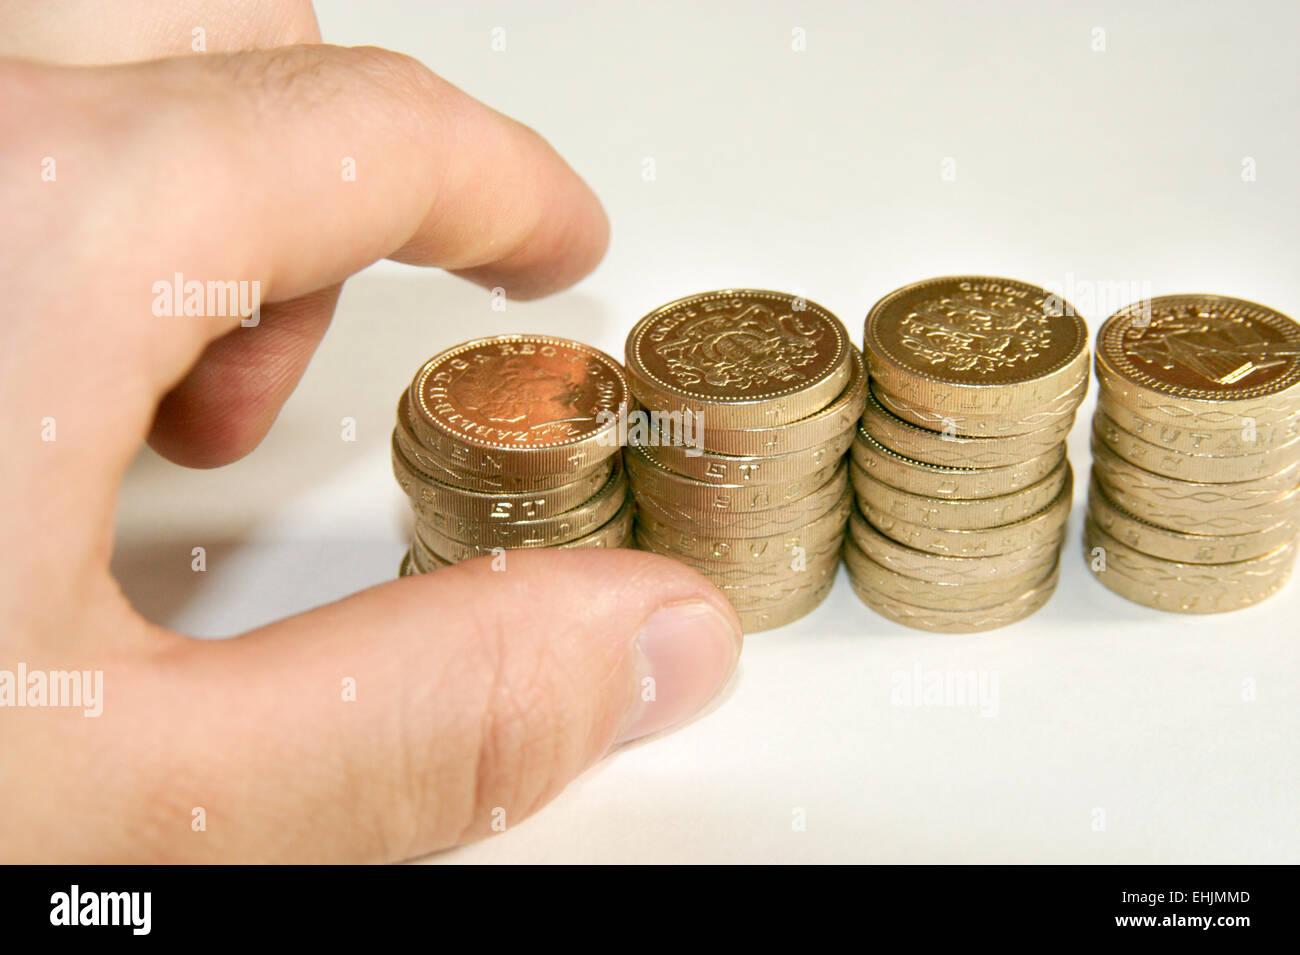 Escrutinio manual cash Sterling Pound monedas Imagen De Stock